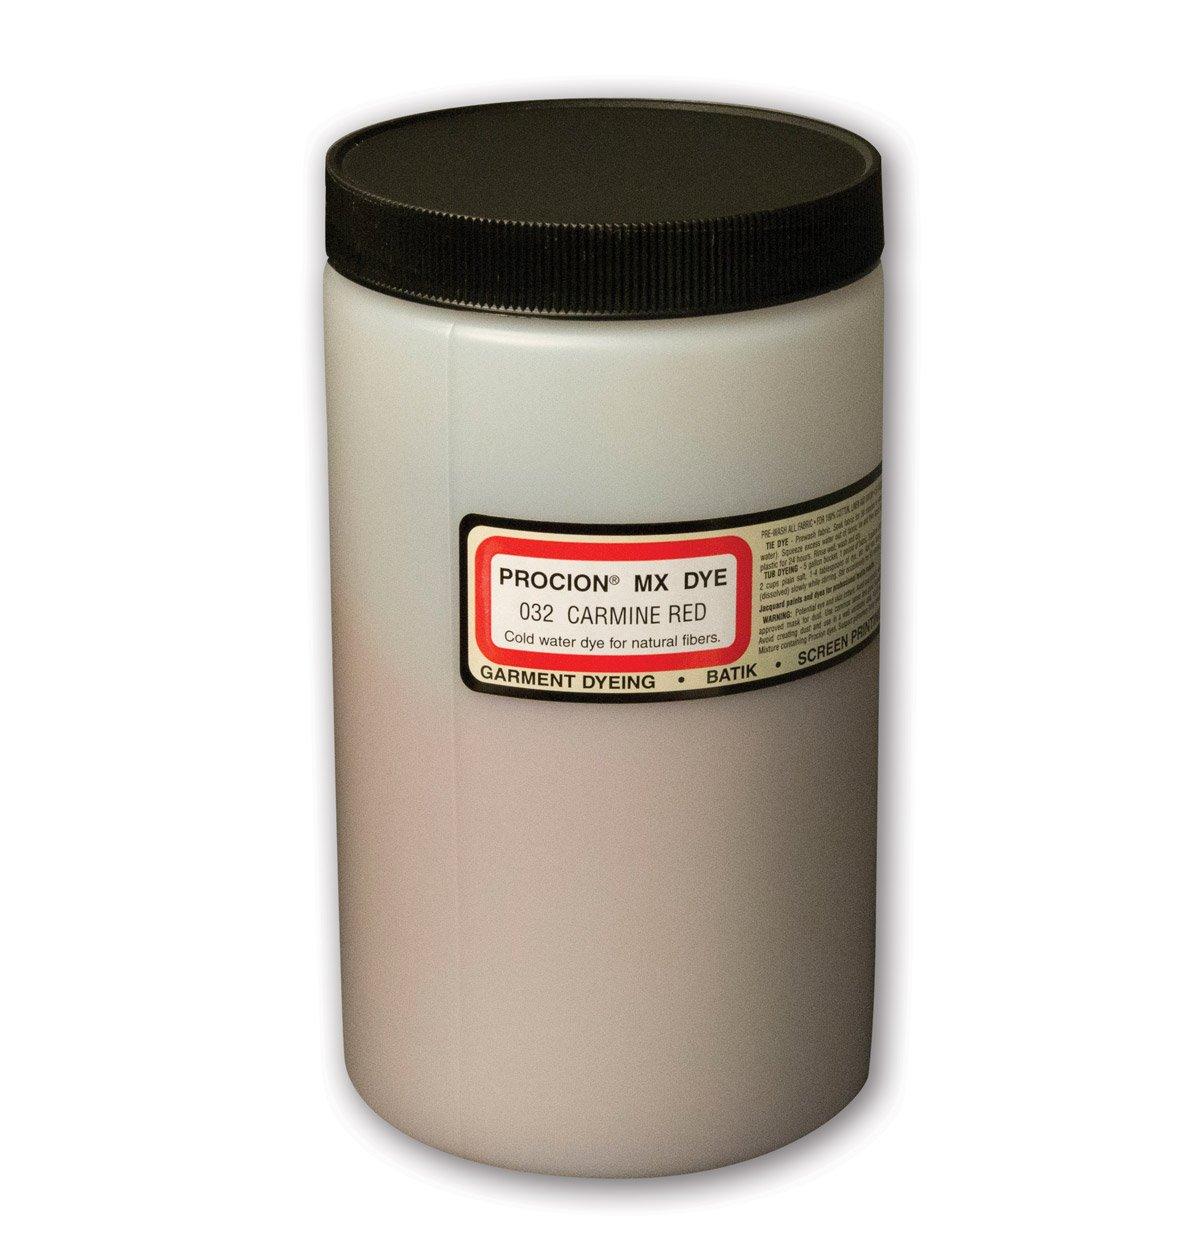 Procion Mx Dye Carmine Red 1 Lb RUPERT GIBBONS & SPIDER